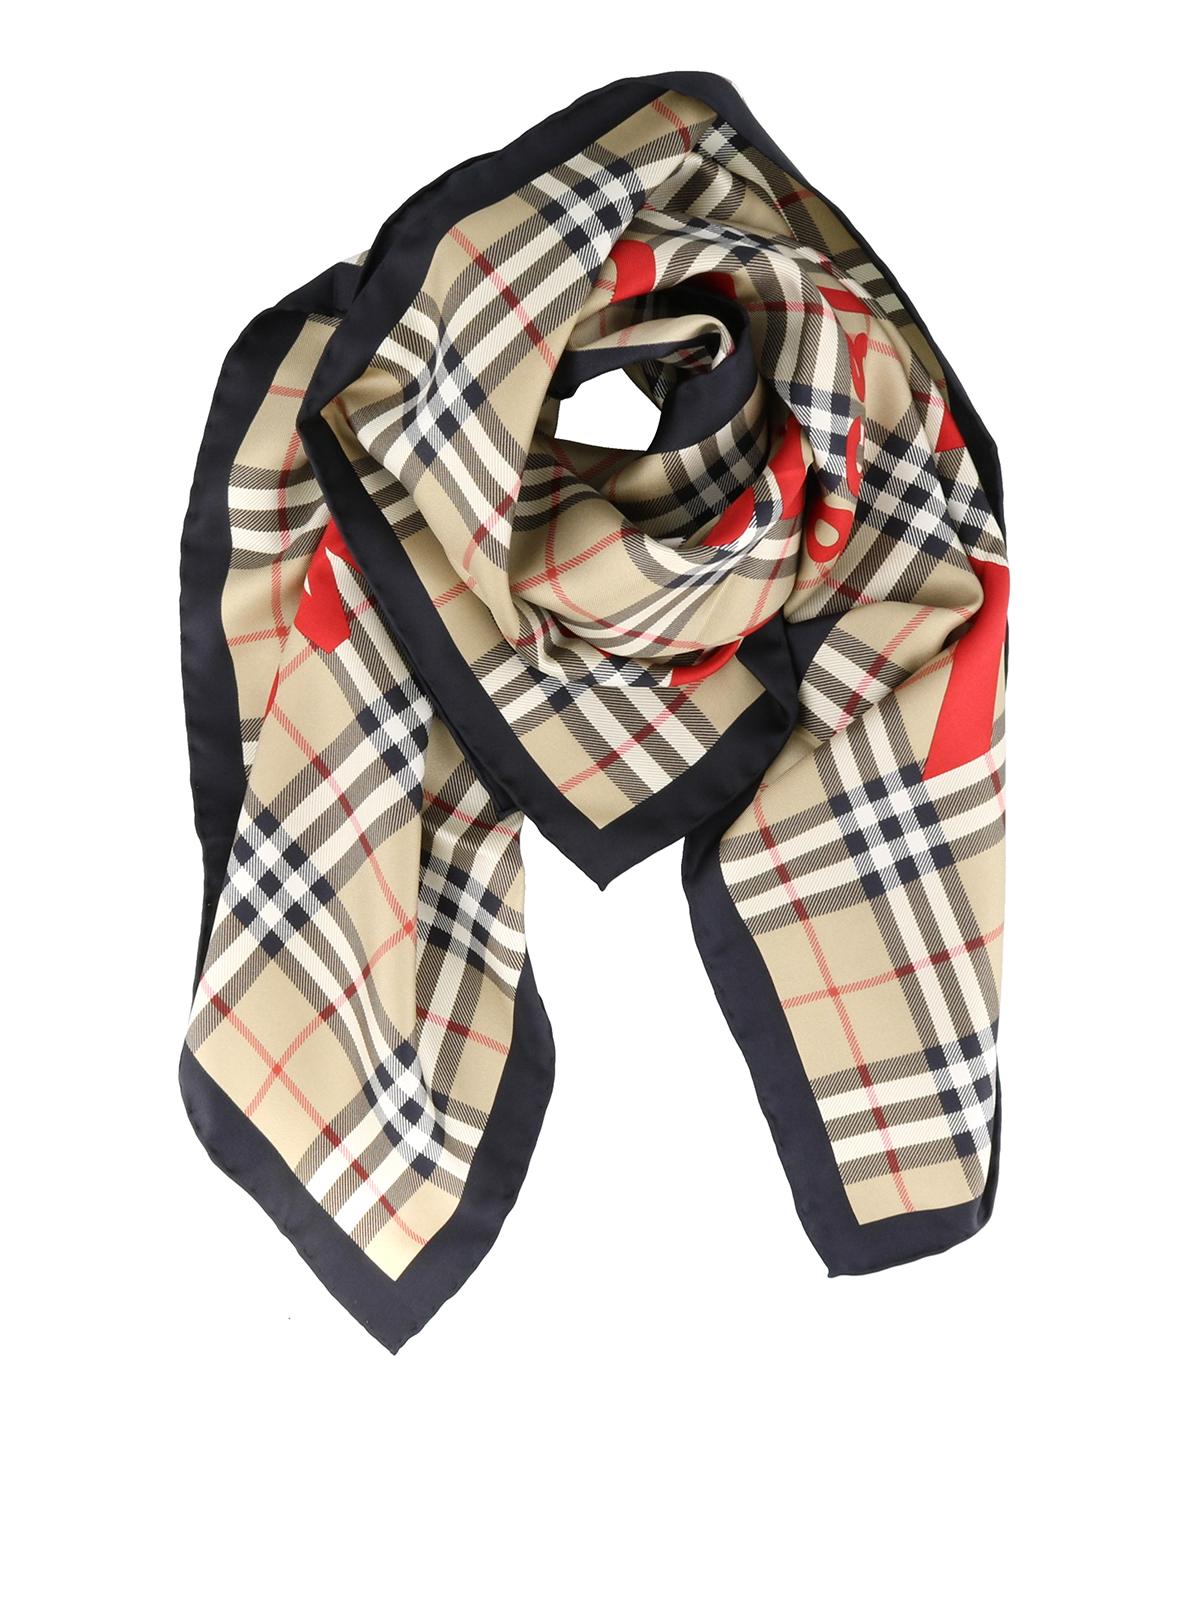 Burberry Foulard Vintage Check in seta sciarpe e foulard